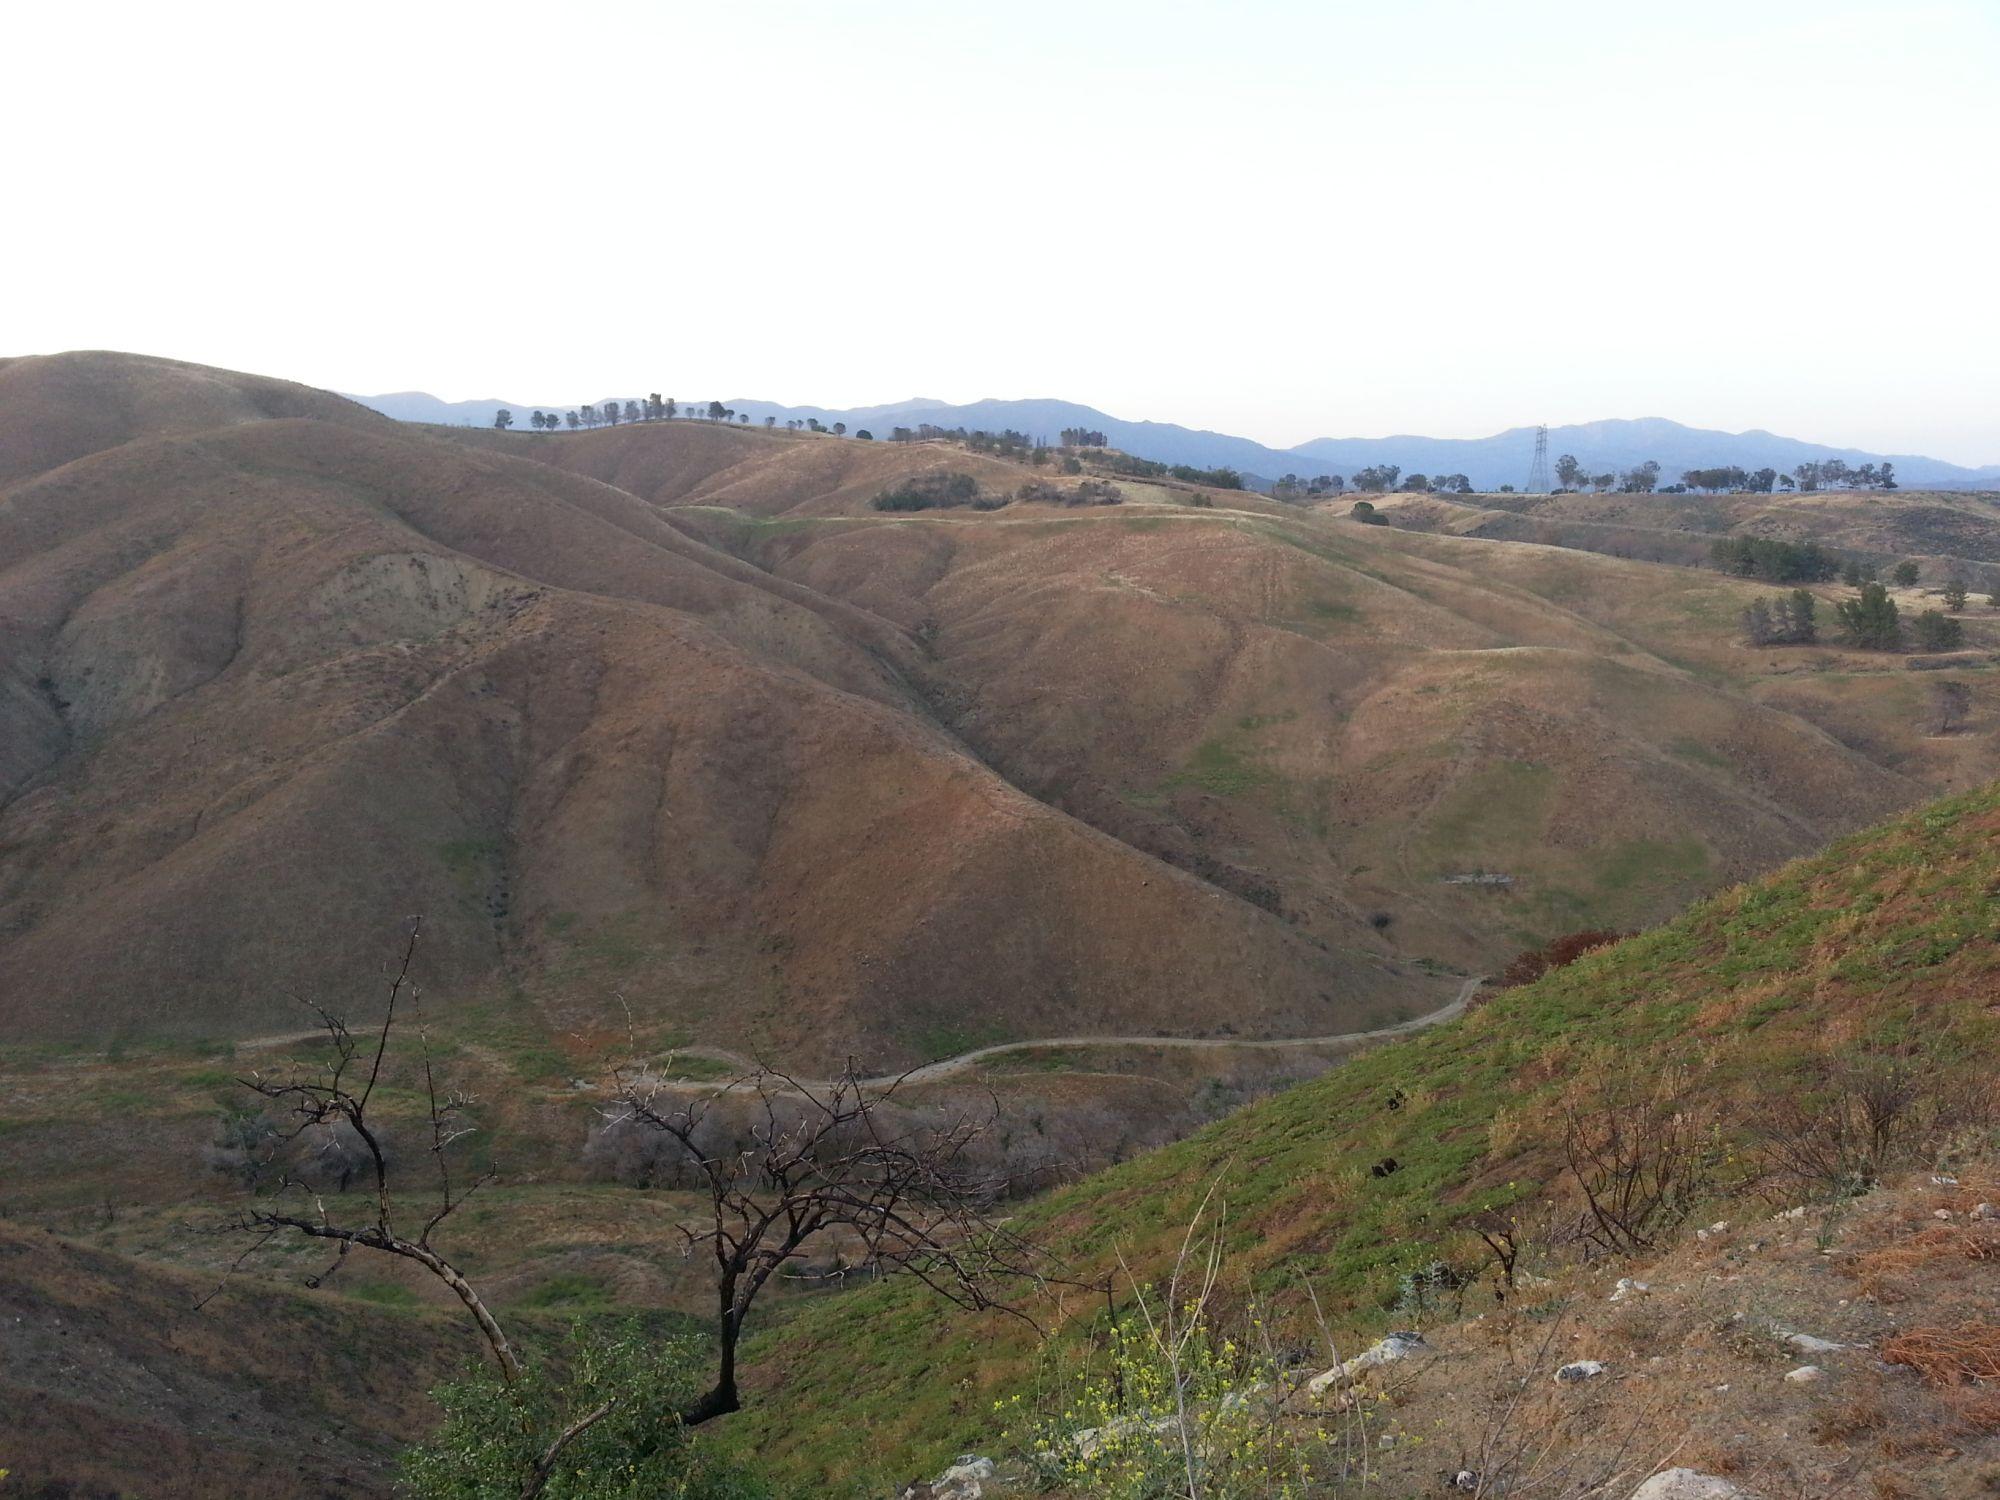 Geocaching Tour along Ridge Route Road in Southern California